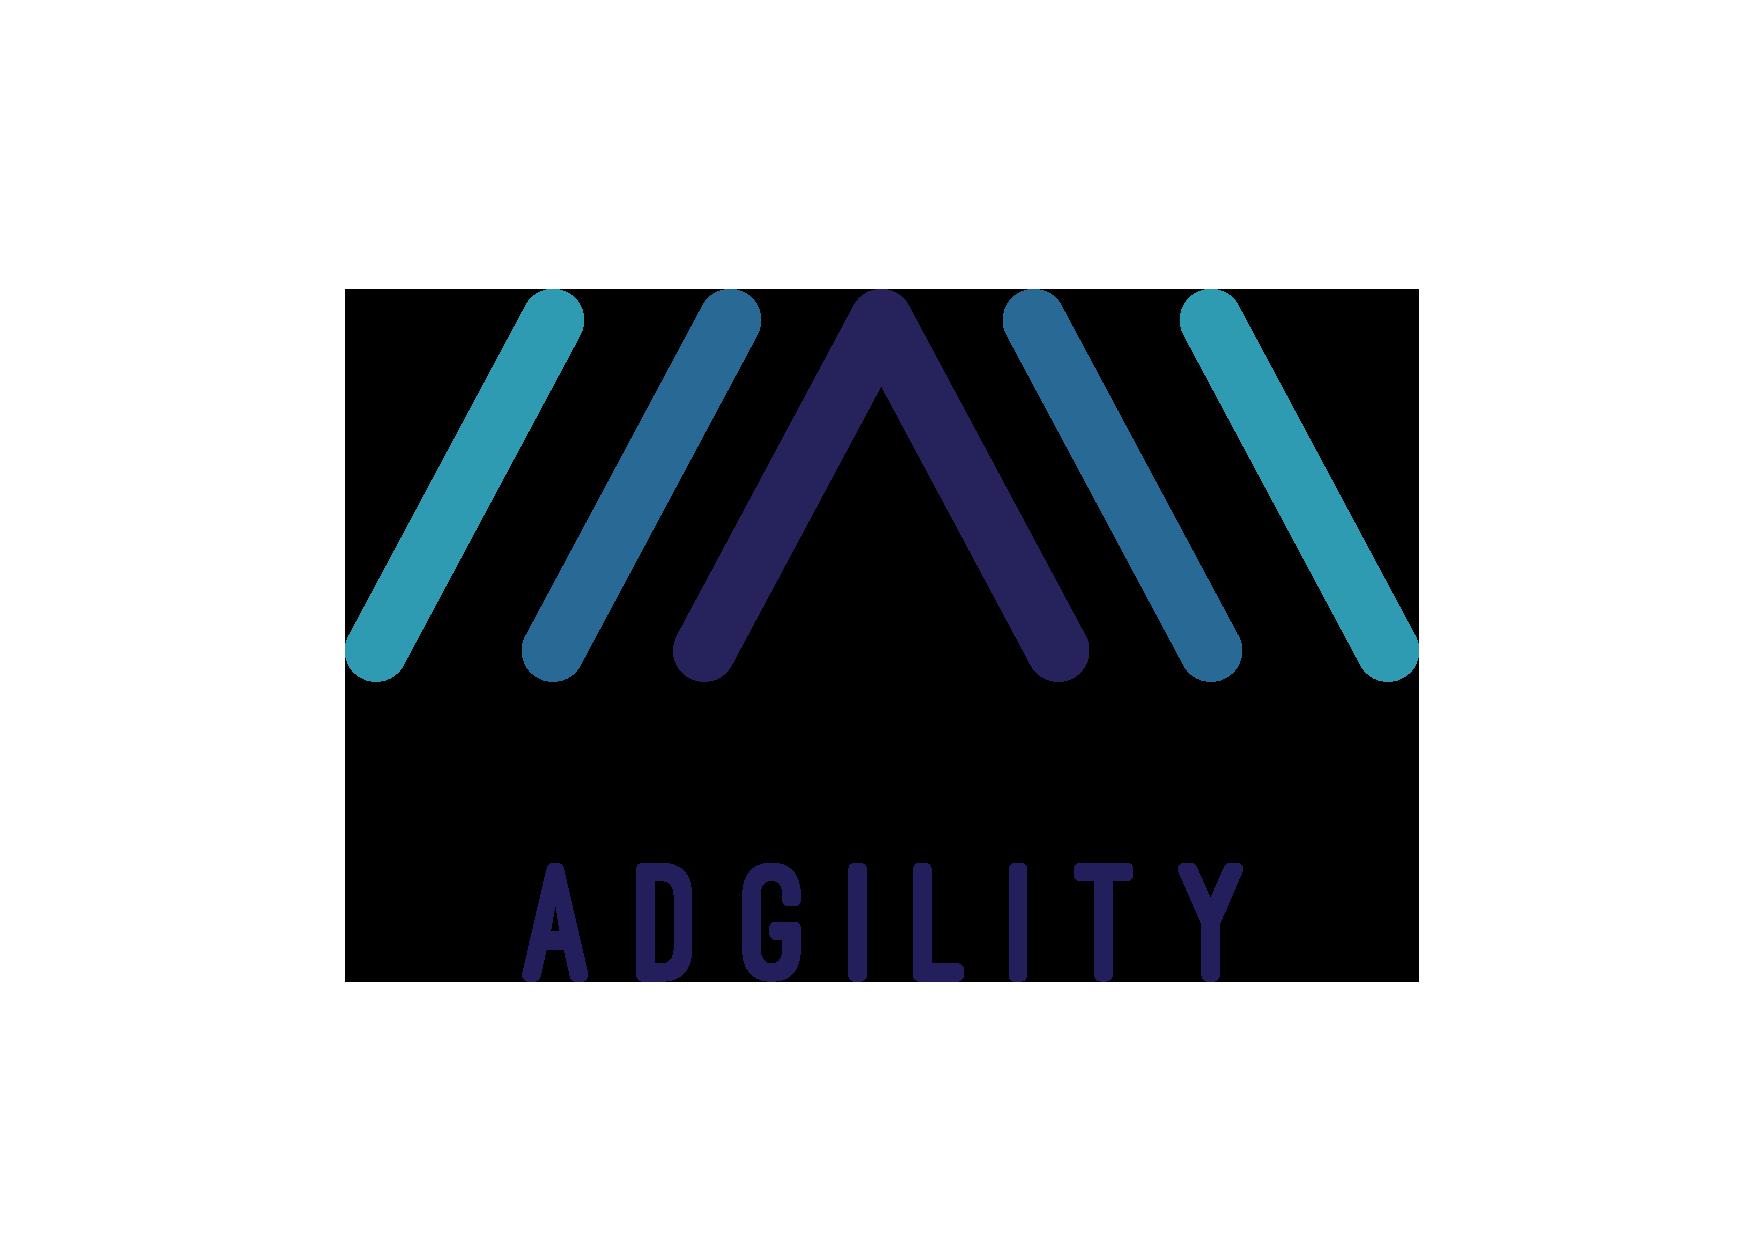 adgility_blues1_transparent-1